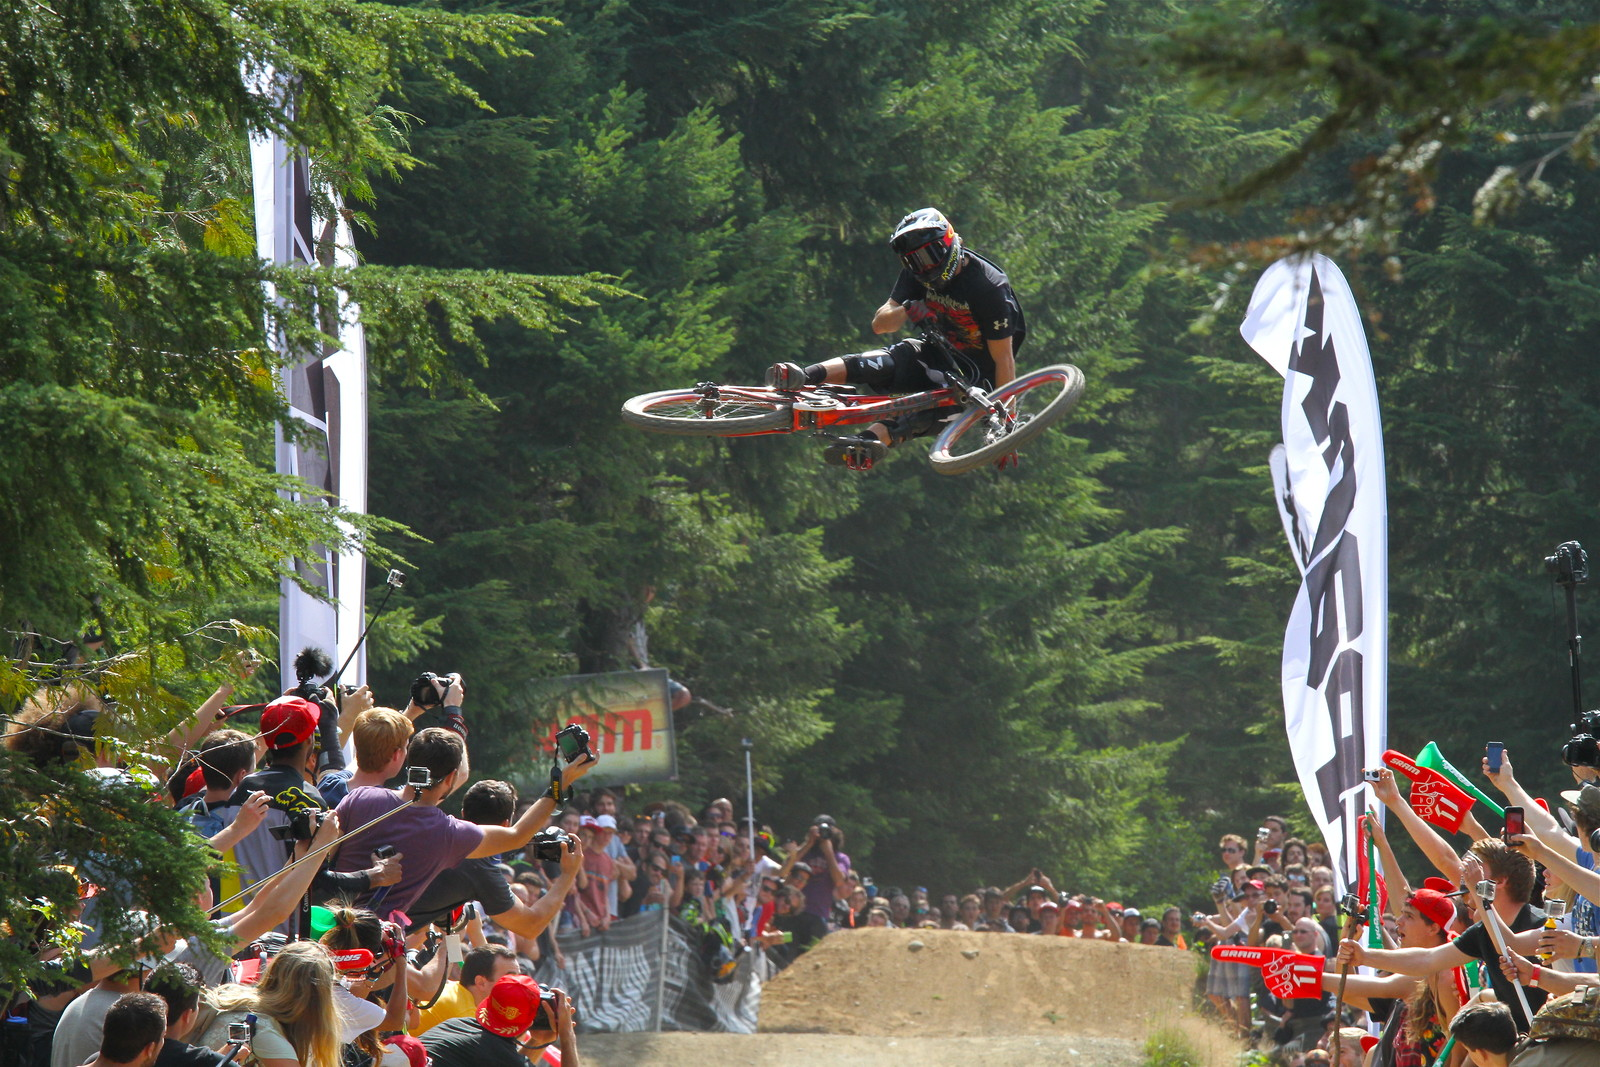 Kurt Sorge/ Giant Bikes - Malcolm Mclaws - Mountain Biking Pictures - Vital MTB